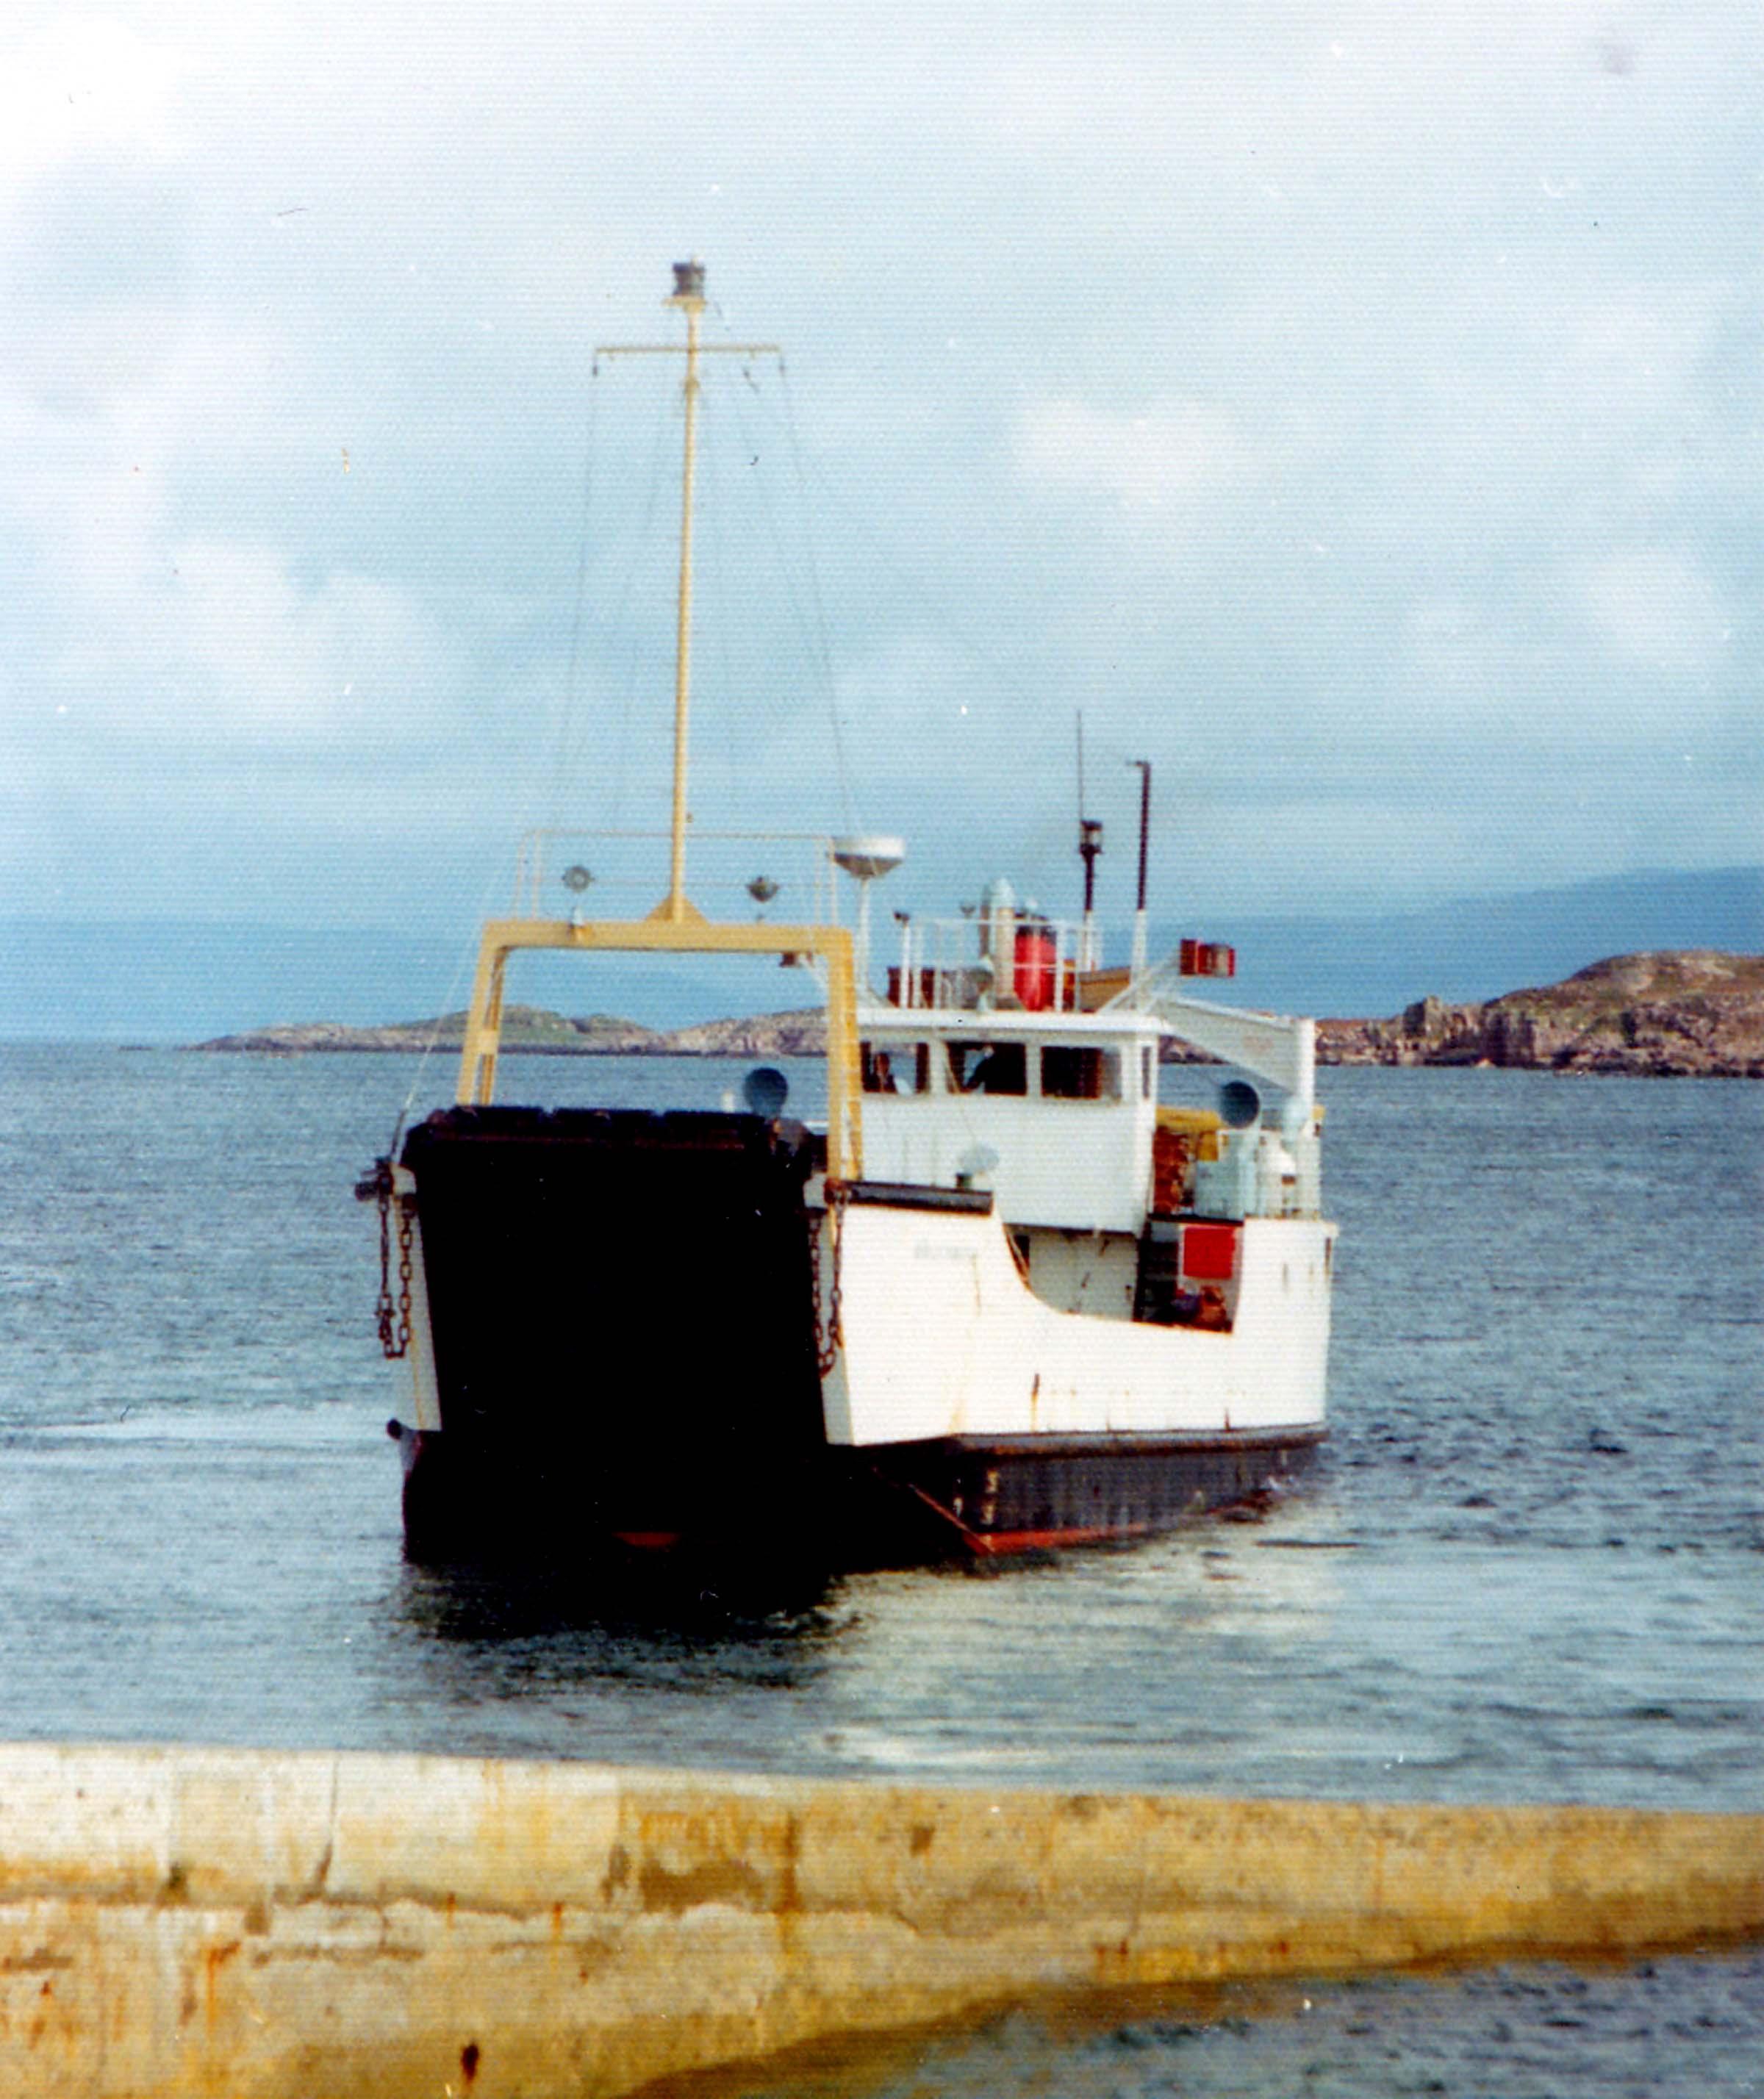 Morvern backing away from Iona slipway (Jim Aikman Smith)